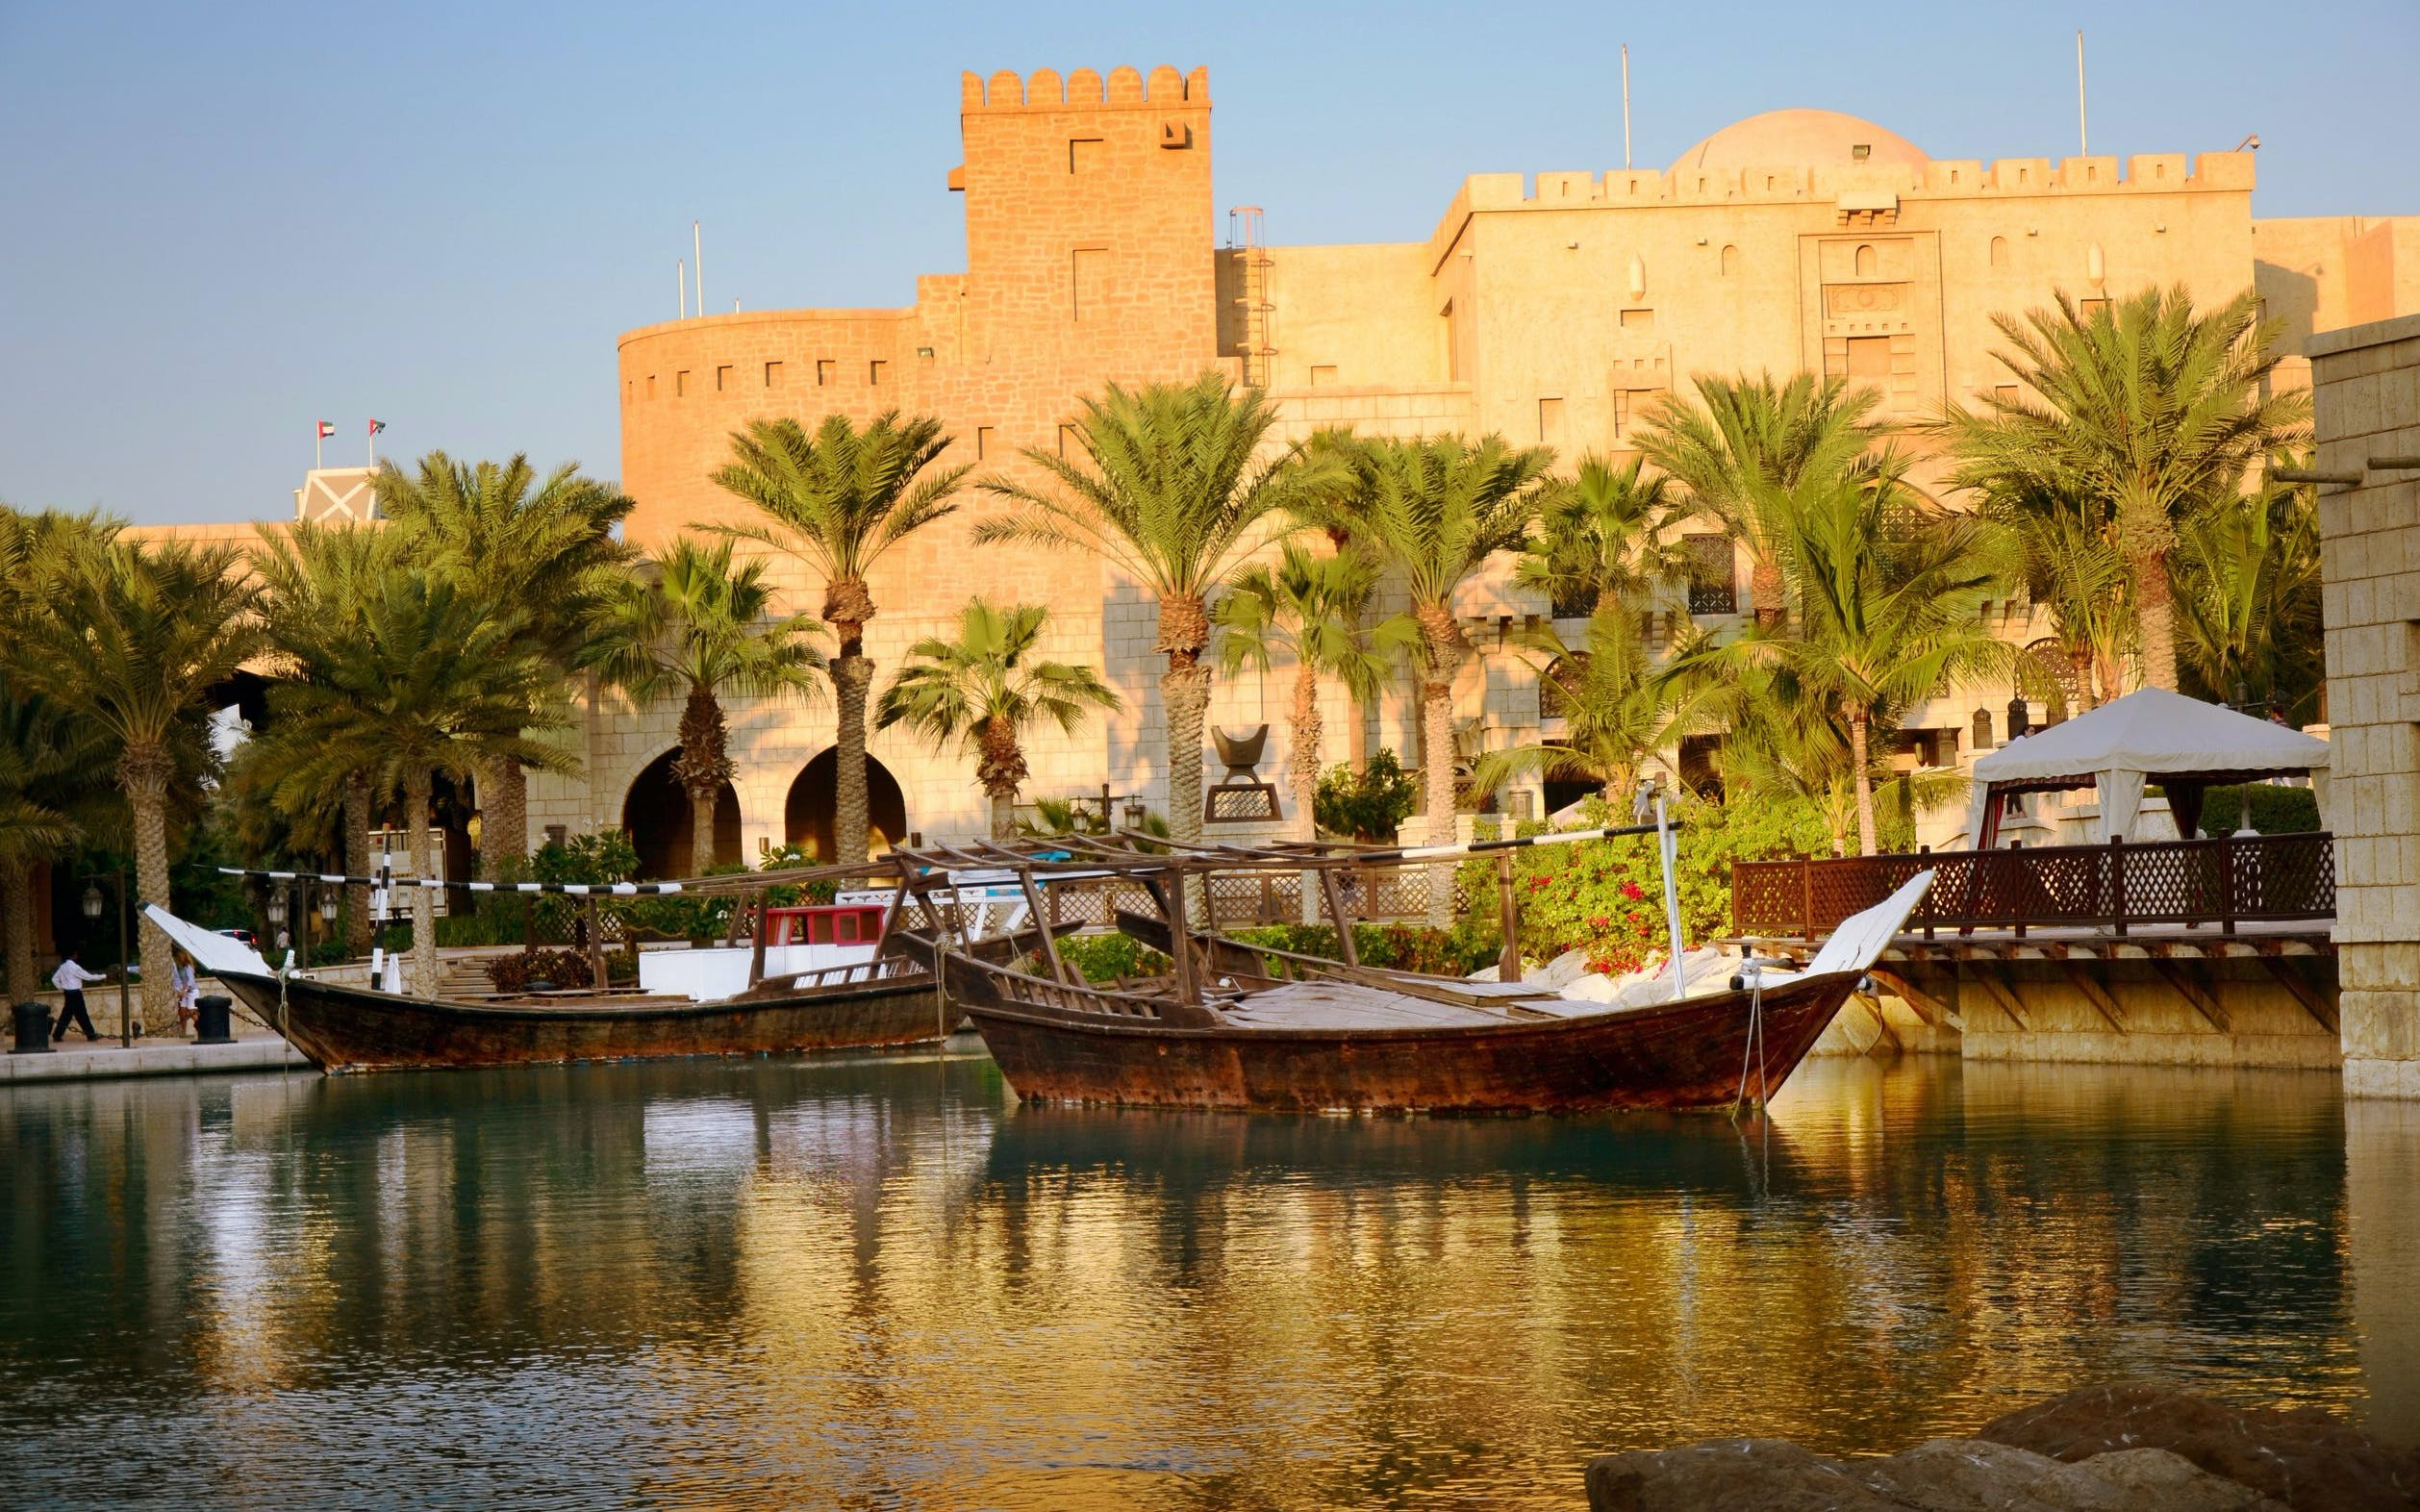 Best dhow cruise in Dubai - Dubai Creek sightseeing